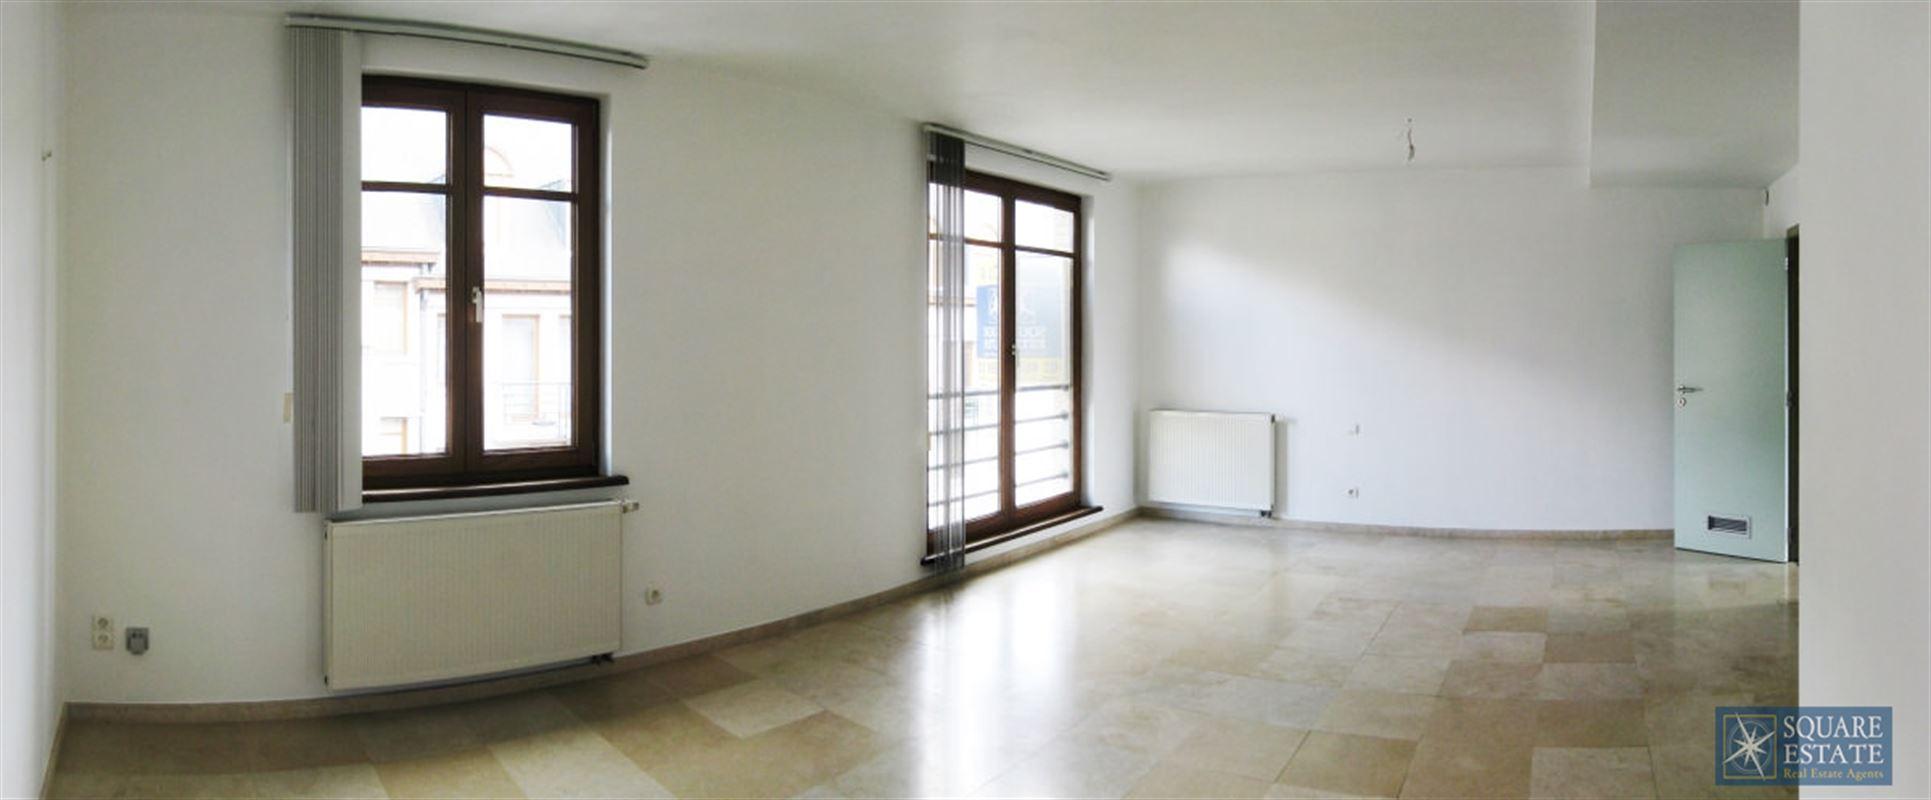 Foto 2 : Duplex/Penthouse te 1780 Wemmel (België) - Prijs € 1.100